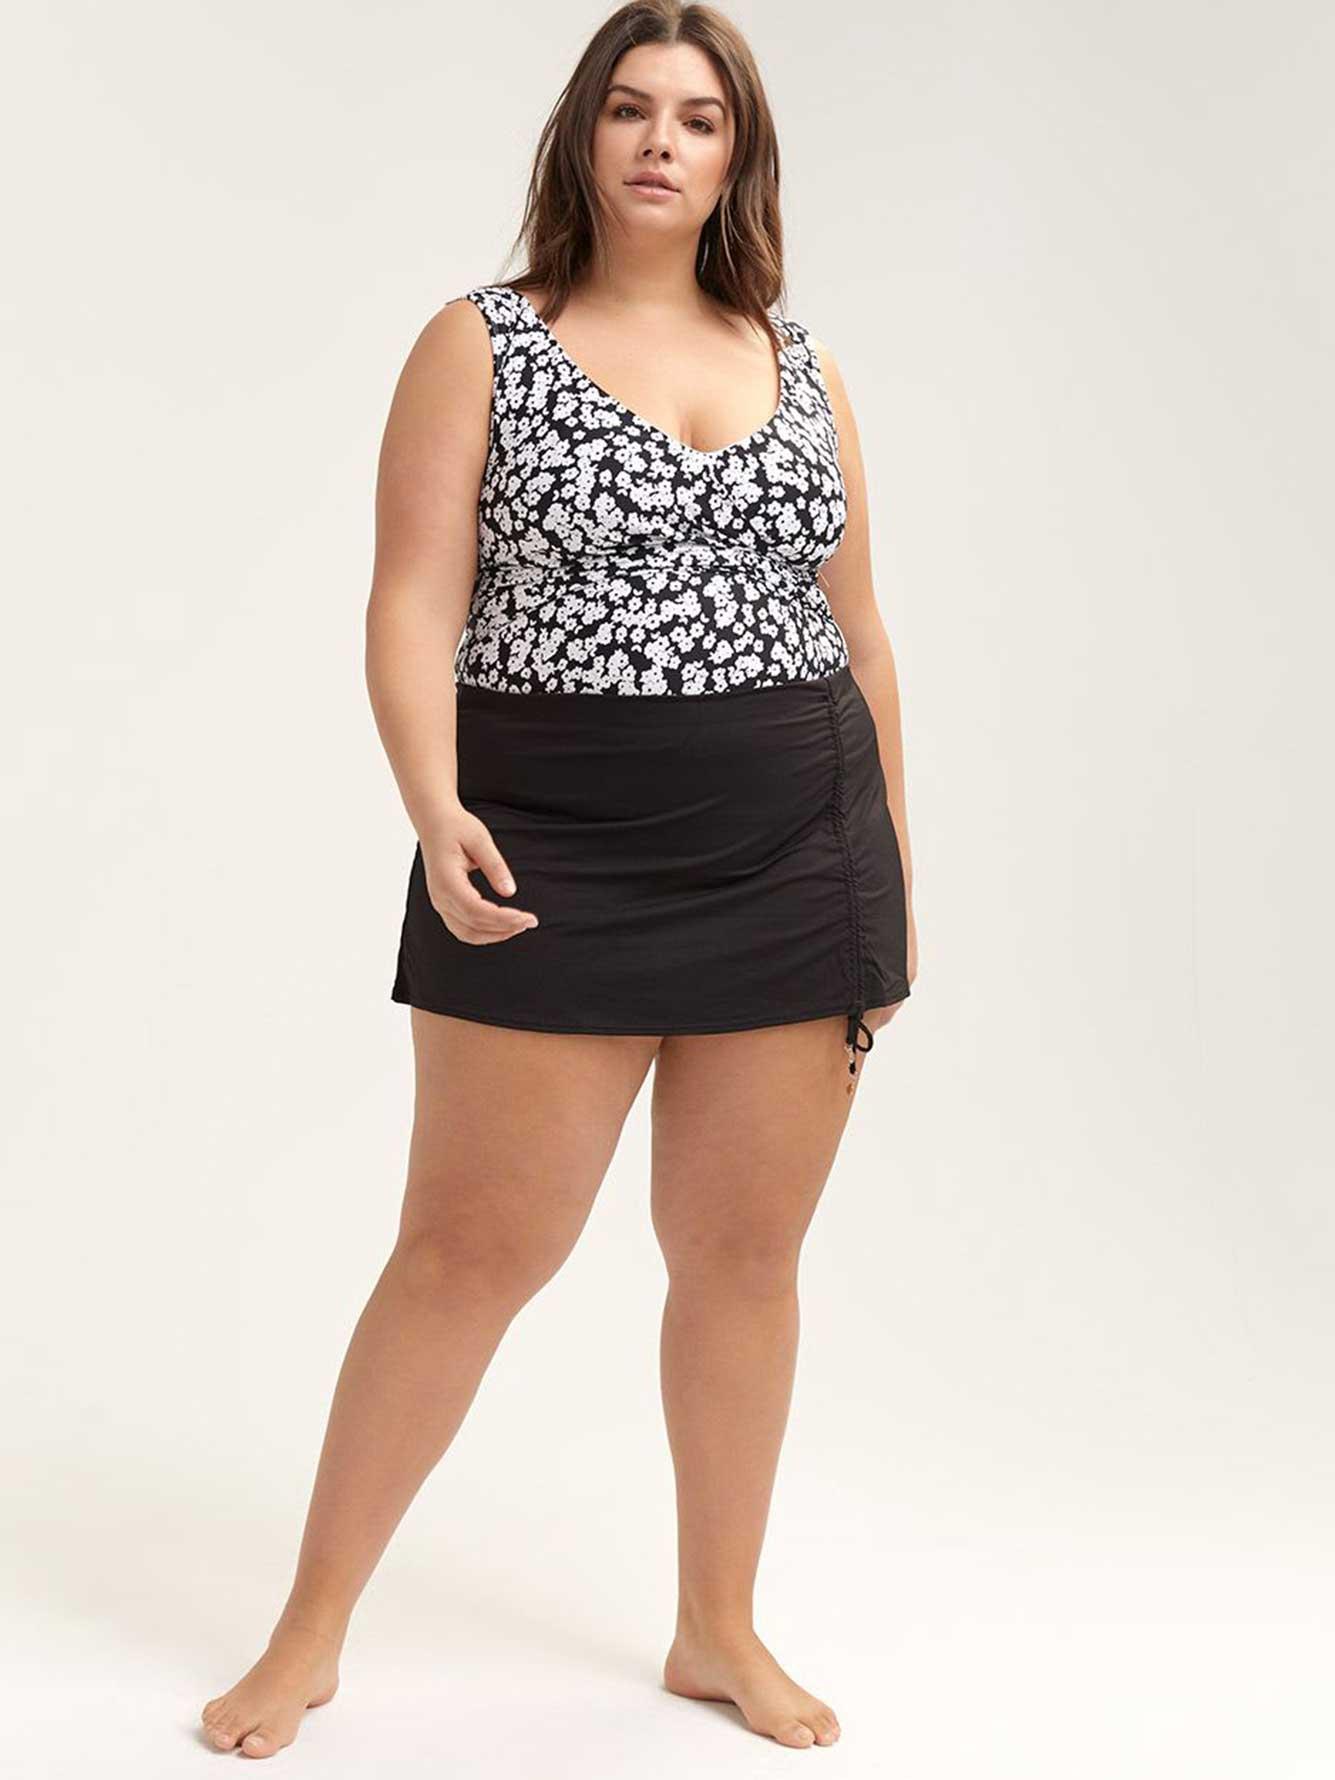 3dacdb26c1cfa Solid Swim Skirt with Cords - Anne Cole